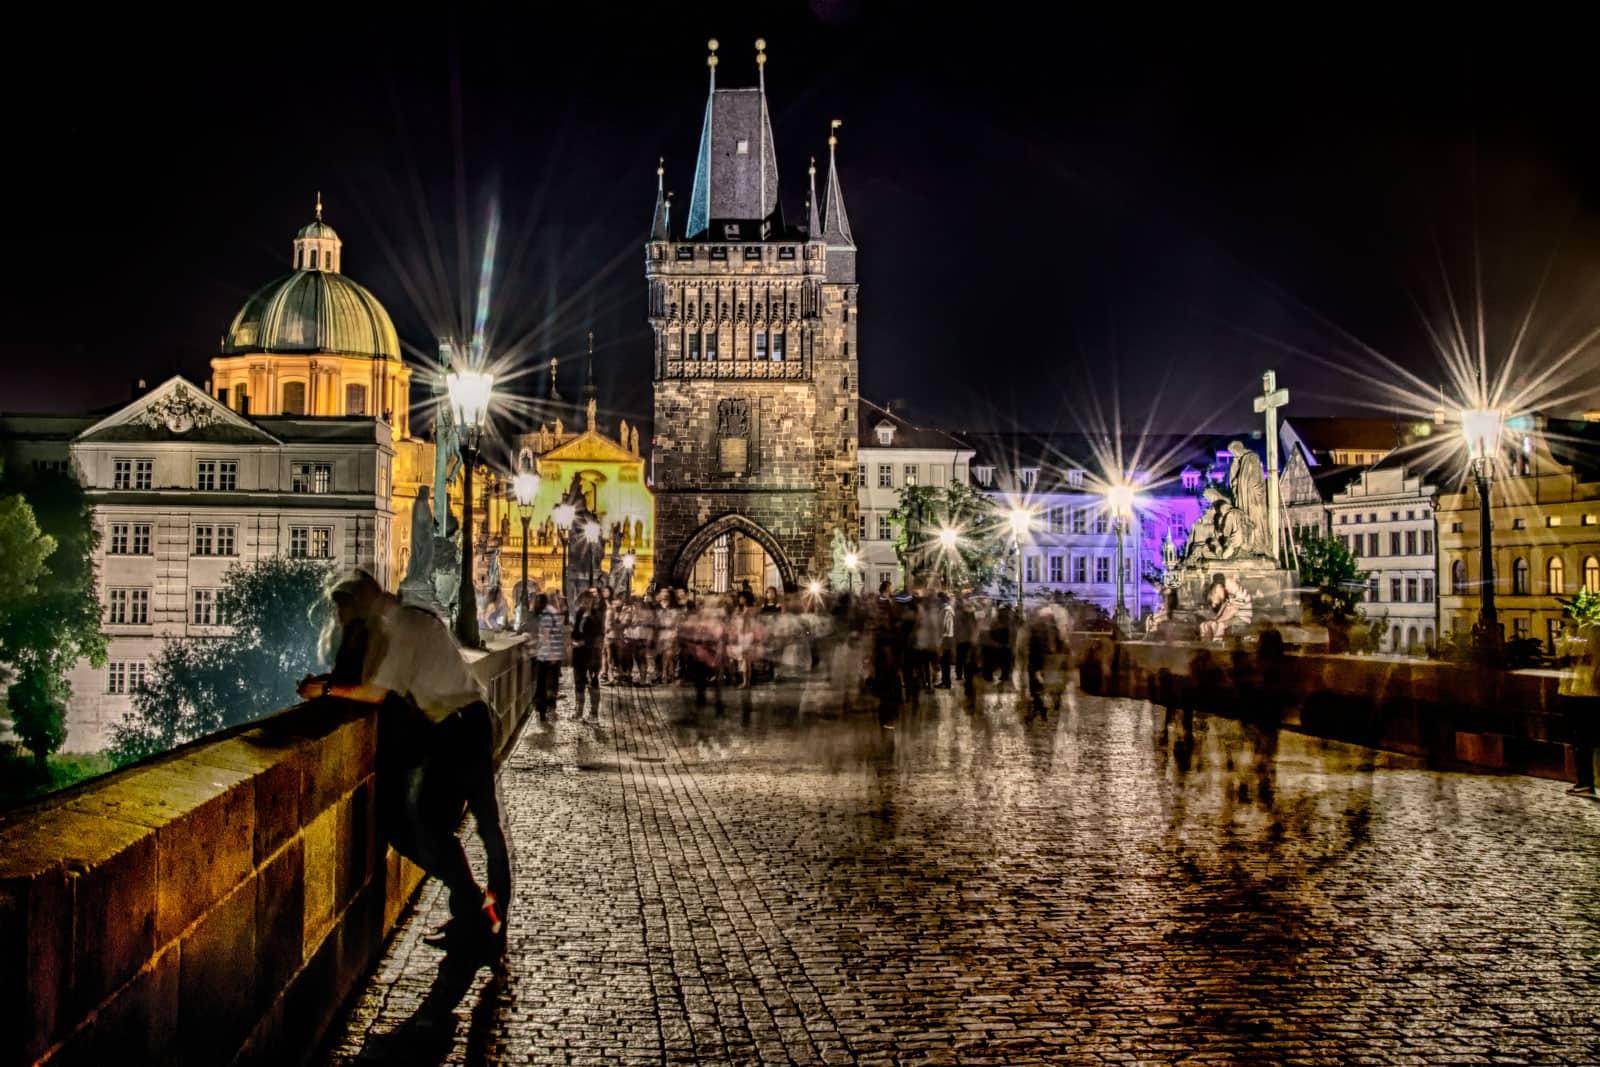 Night on Charles Bridge in Prague, Czech Republic